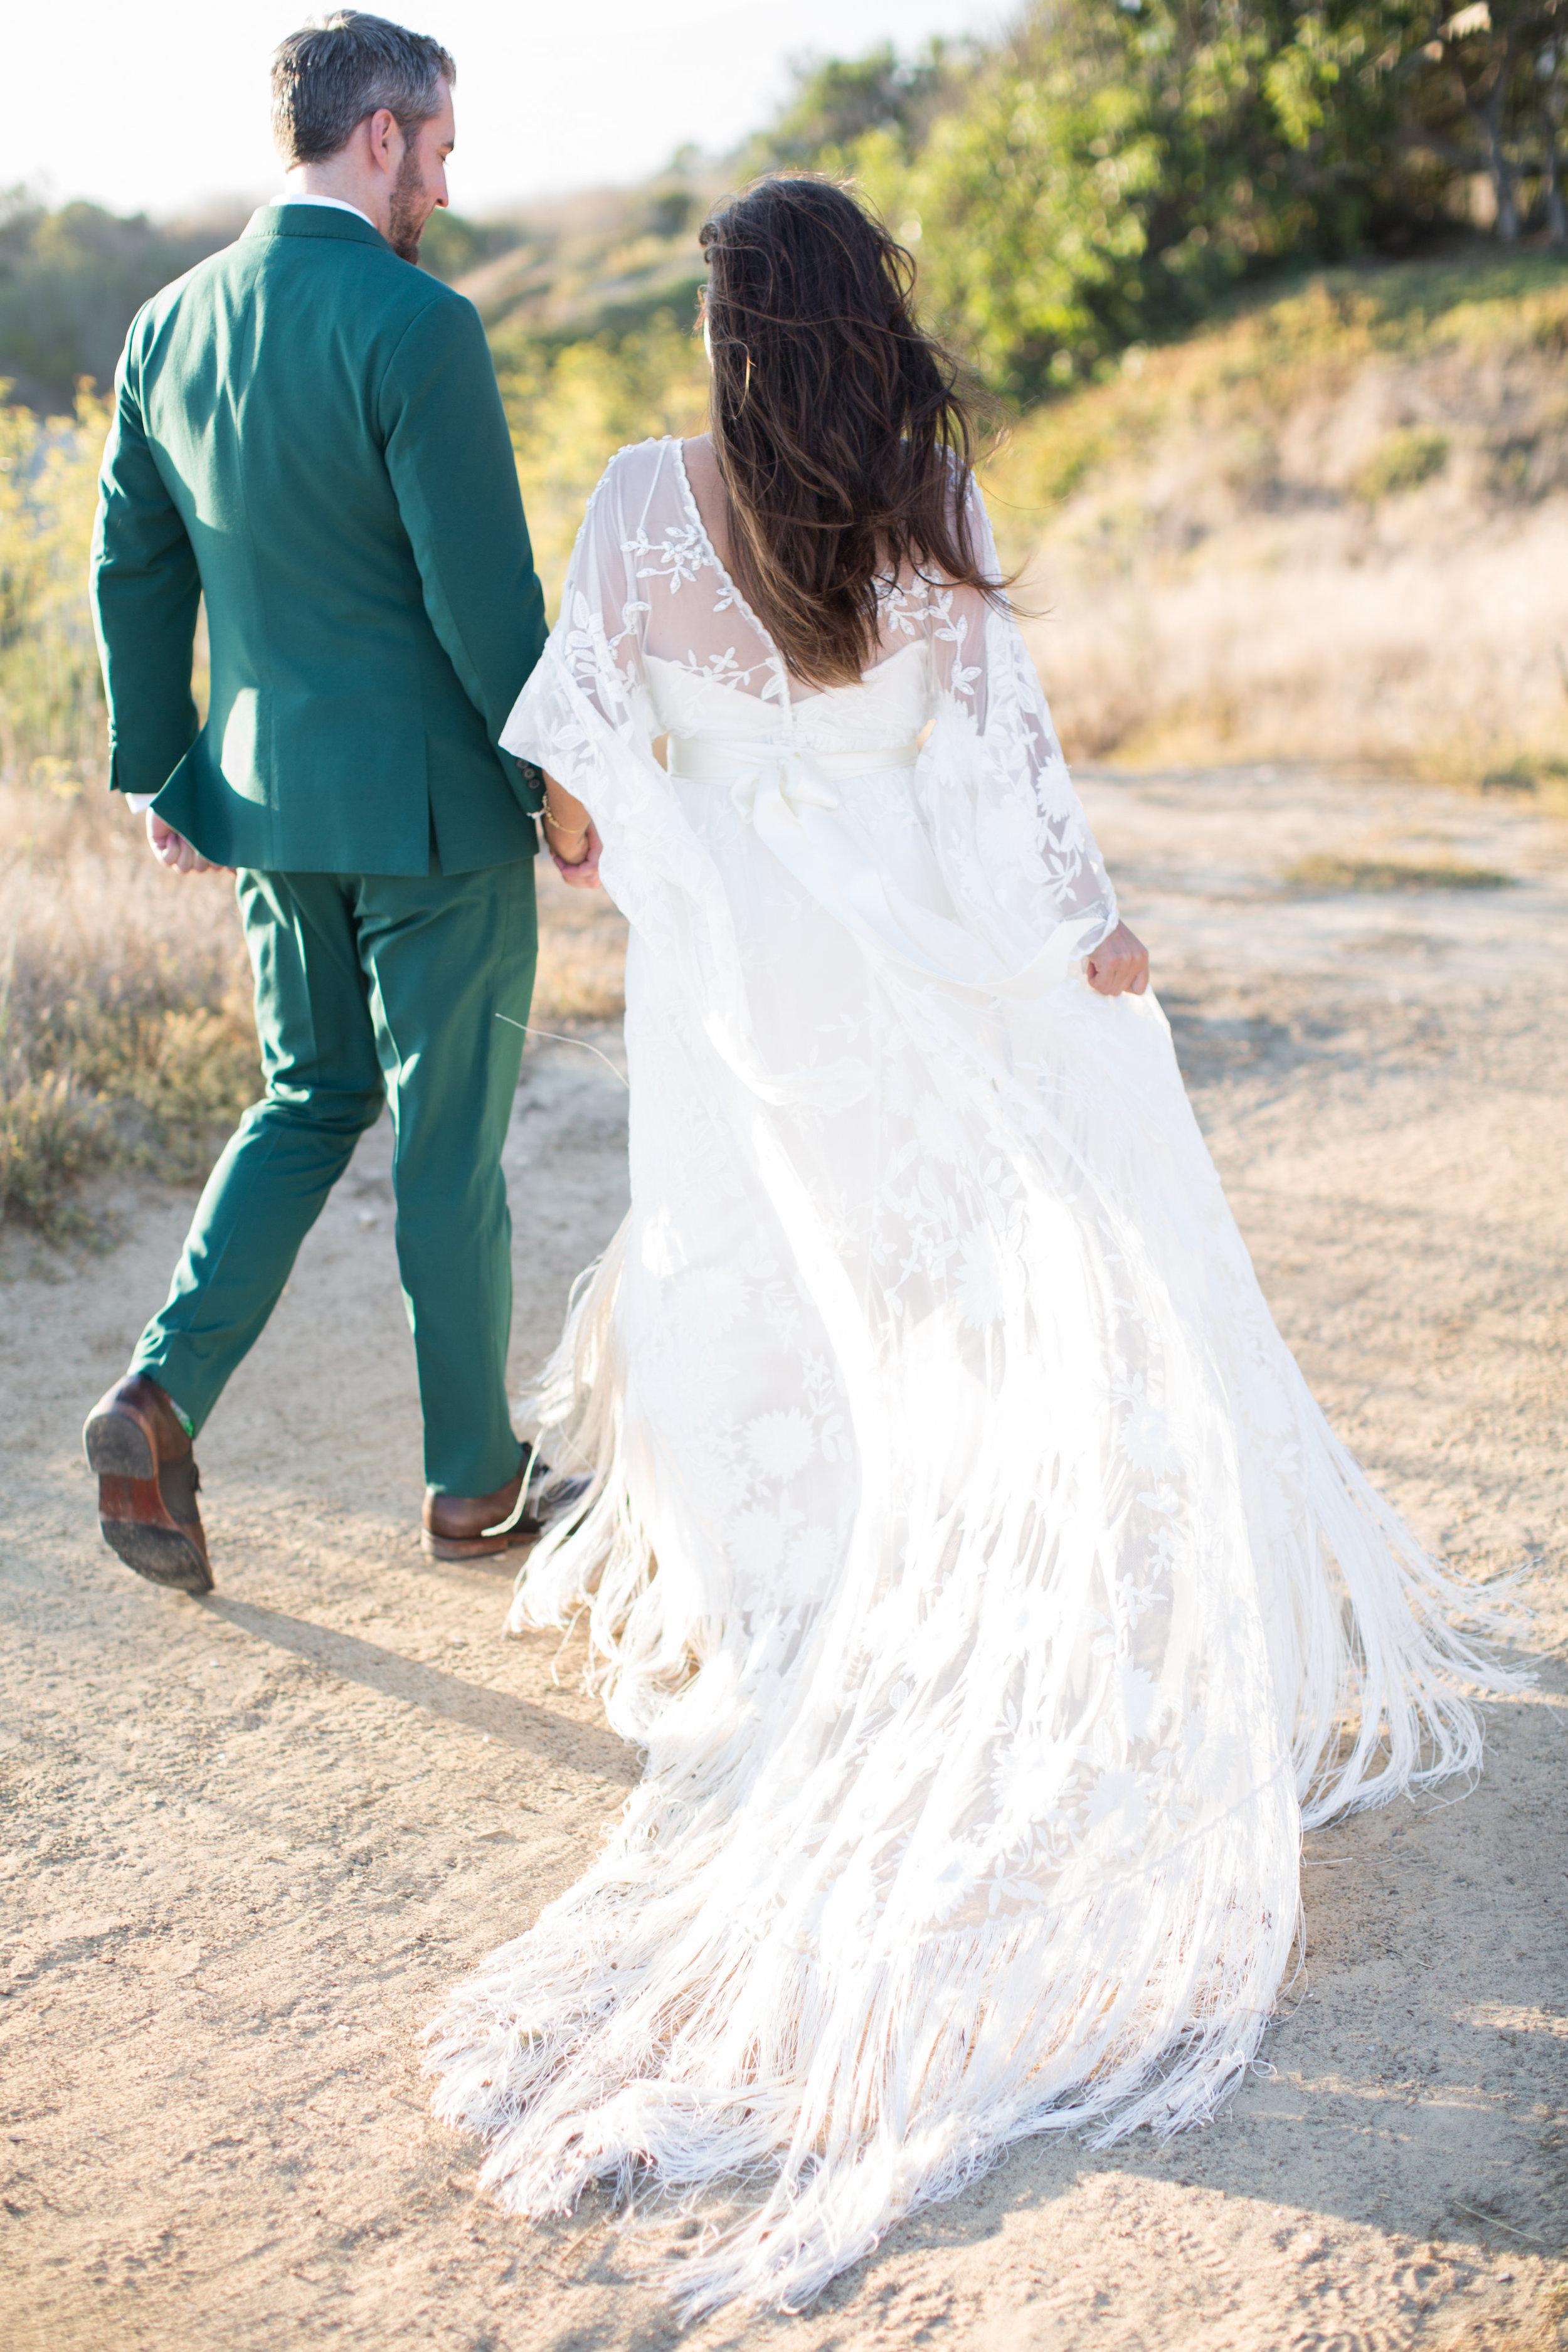 santa-barbara-elopement-elope-wedding-pop-up-coordinator-day-of-event-planning-planner-ellwood-bluff-eucalyptus-grove-rustic-ocean-view-front-hop-green-suit (1 (17).jpg